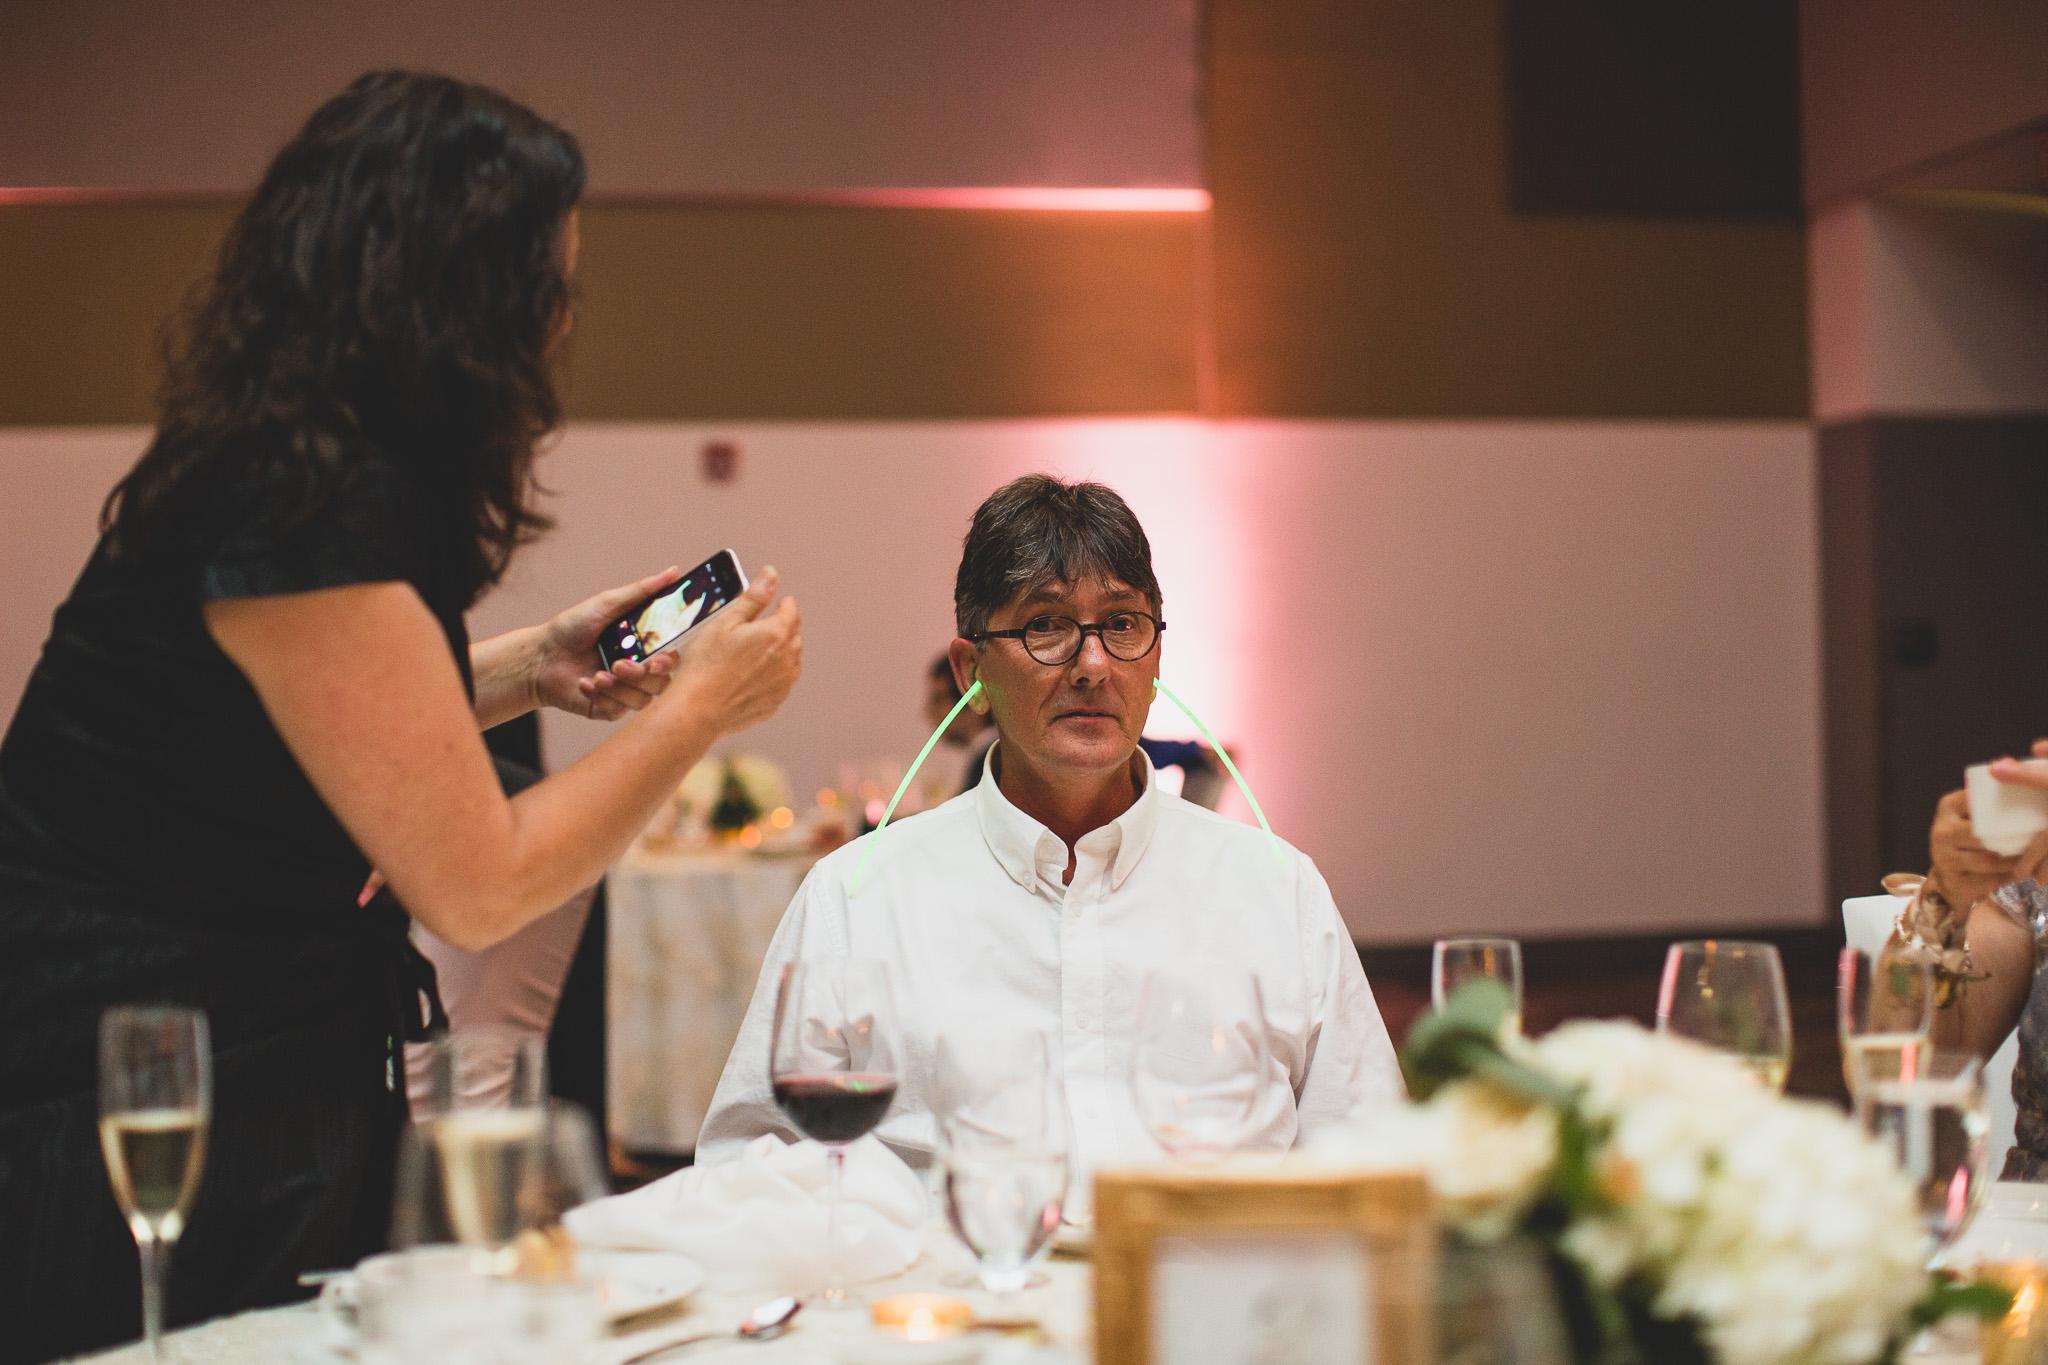 fun-natural-wedding-photos-Ottawa